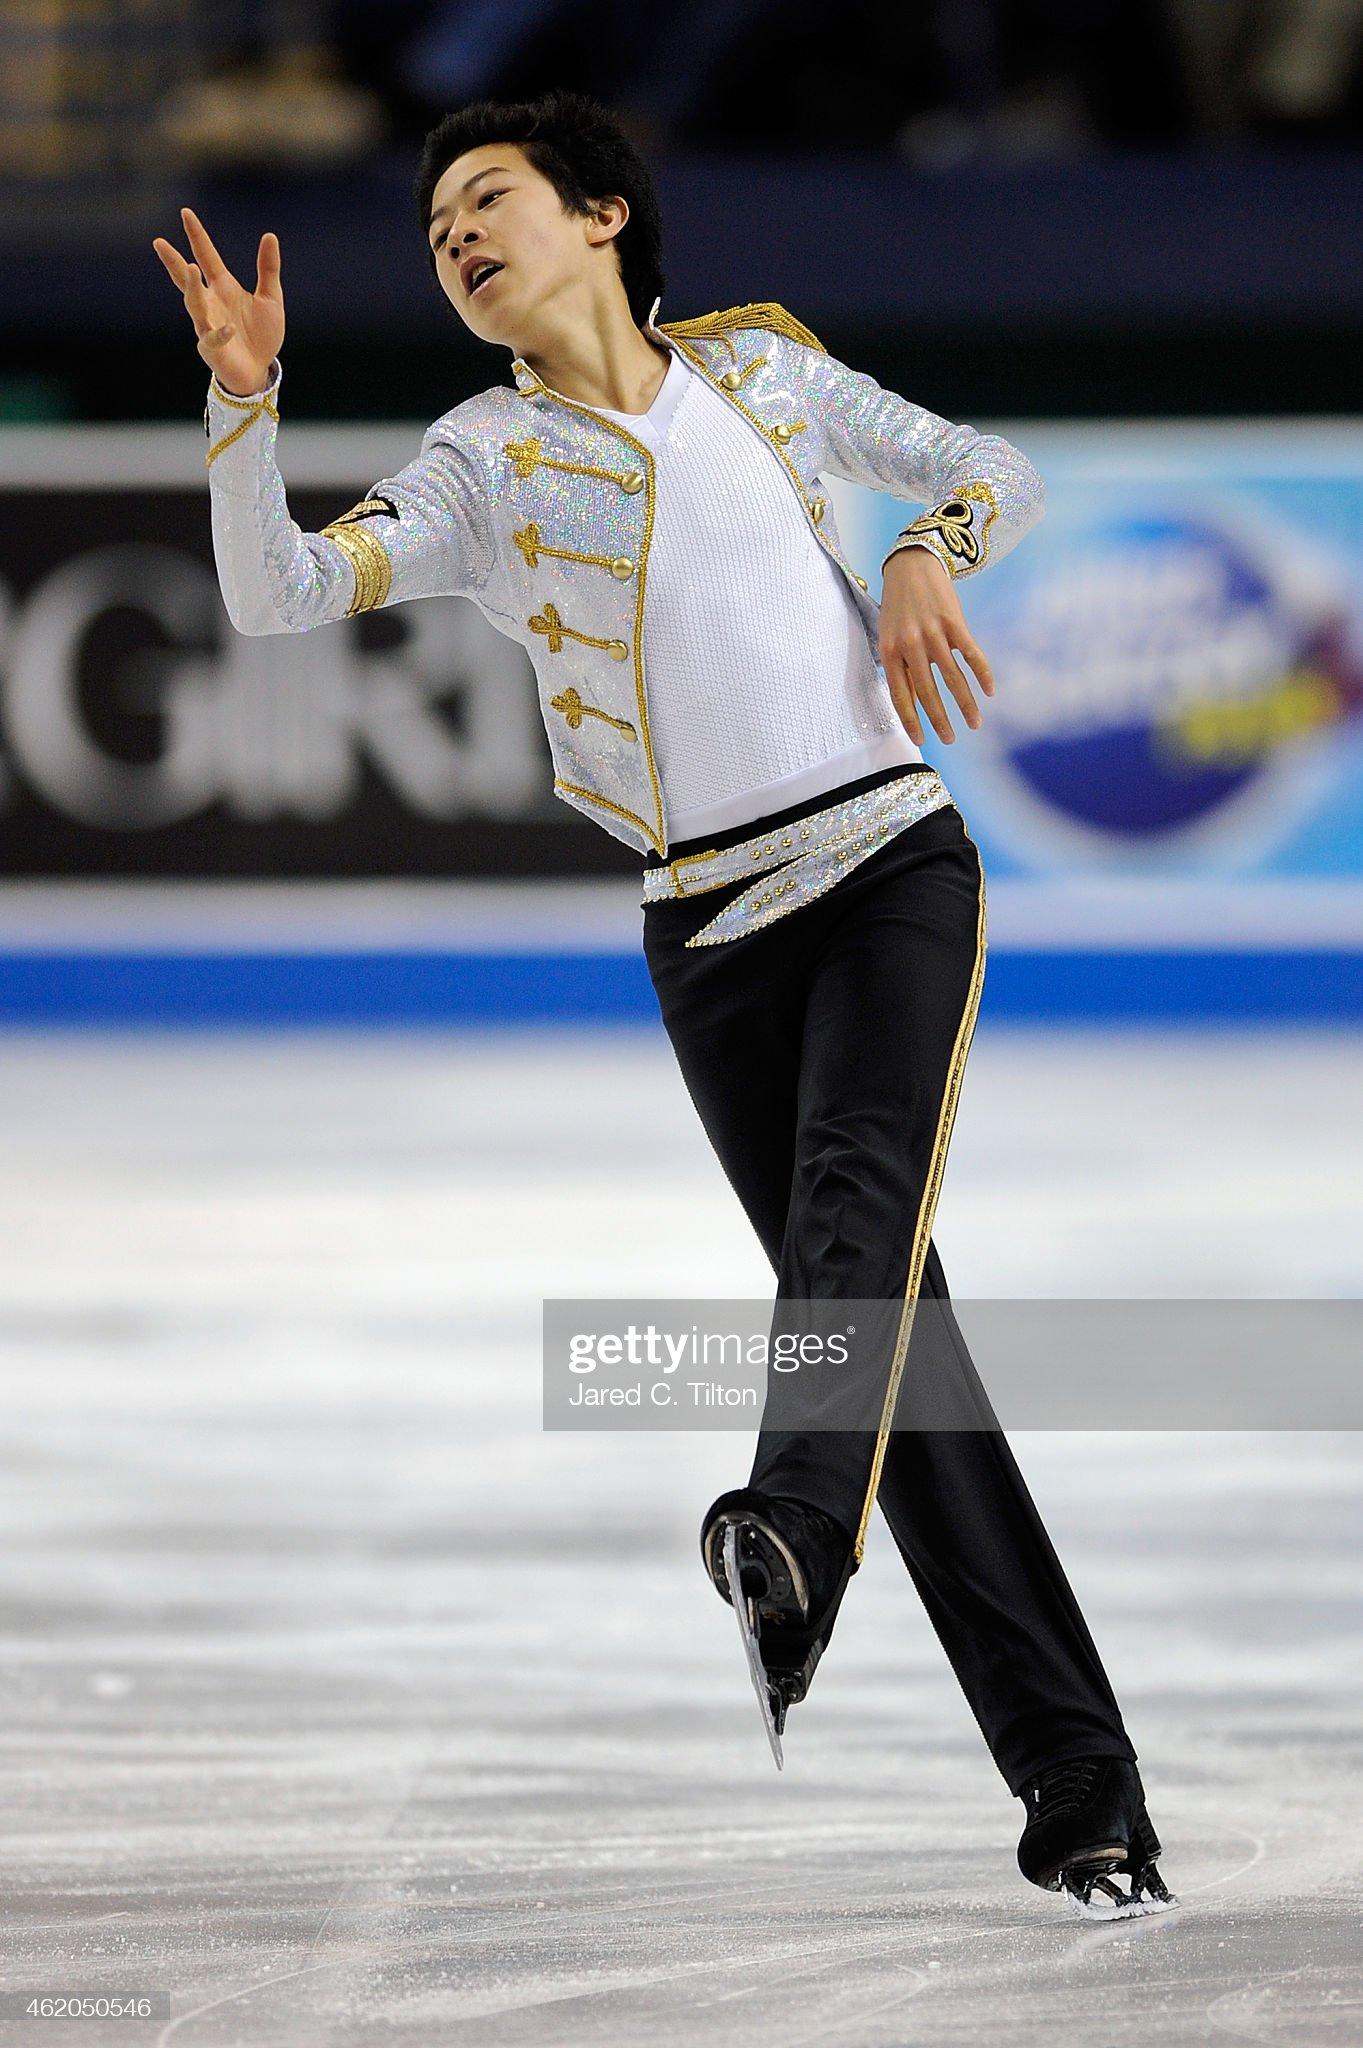 2015 Prudential U.S. Figure Skating Championships - Day 2 : ニュース写真